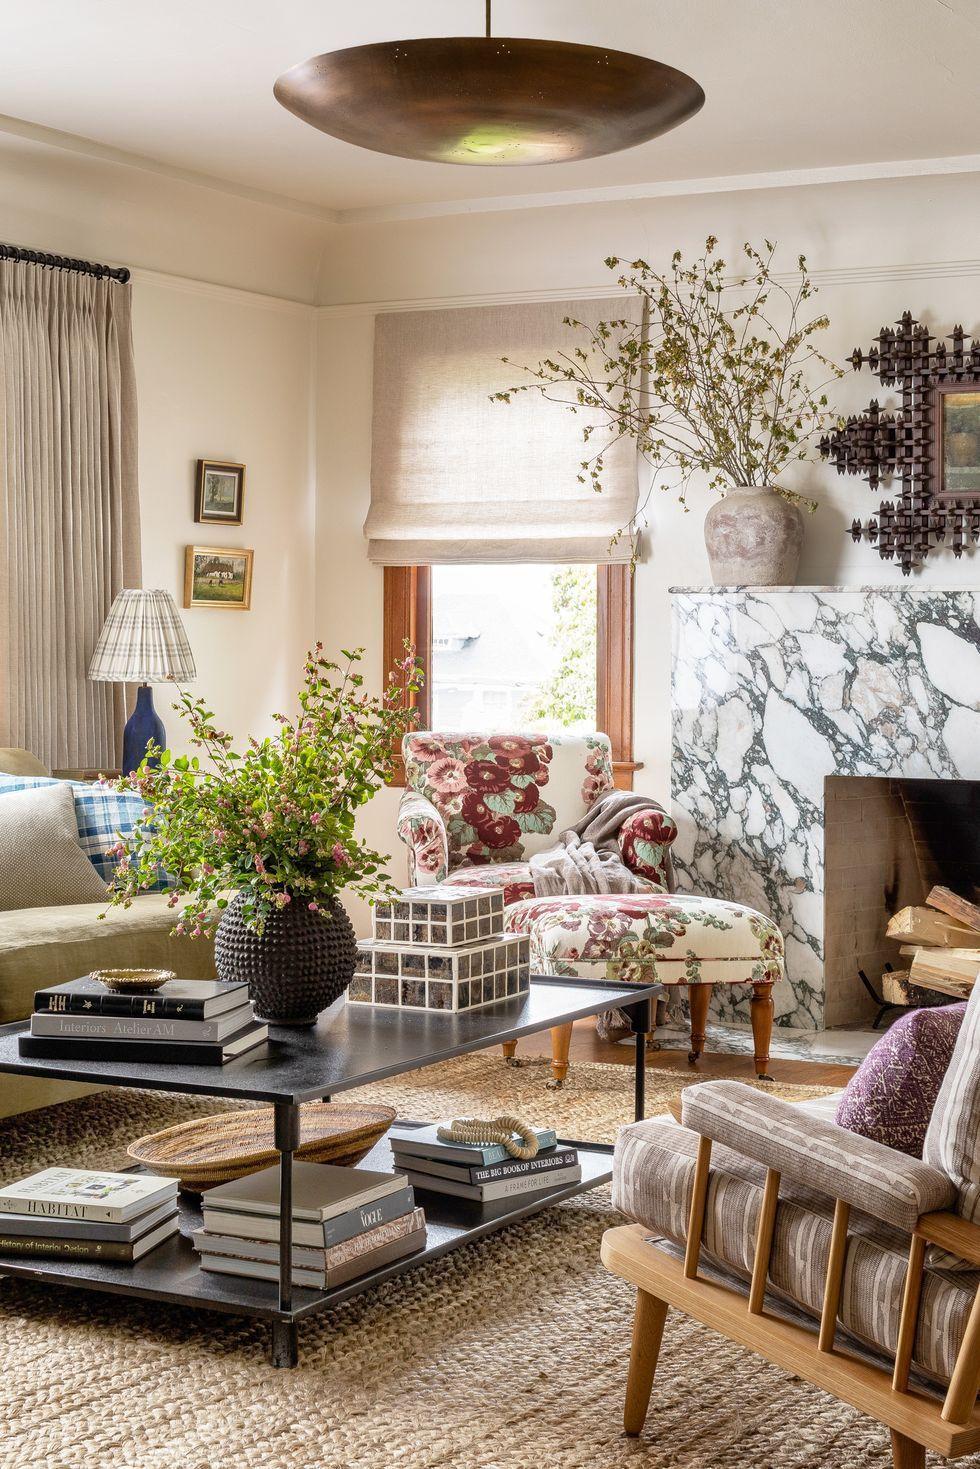 28 Living Room Furniture Design Ideas 2021 In 2020 Living